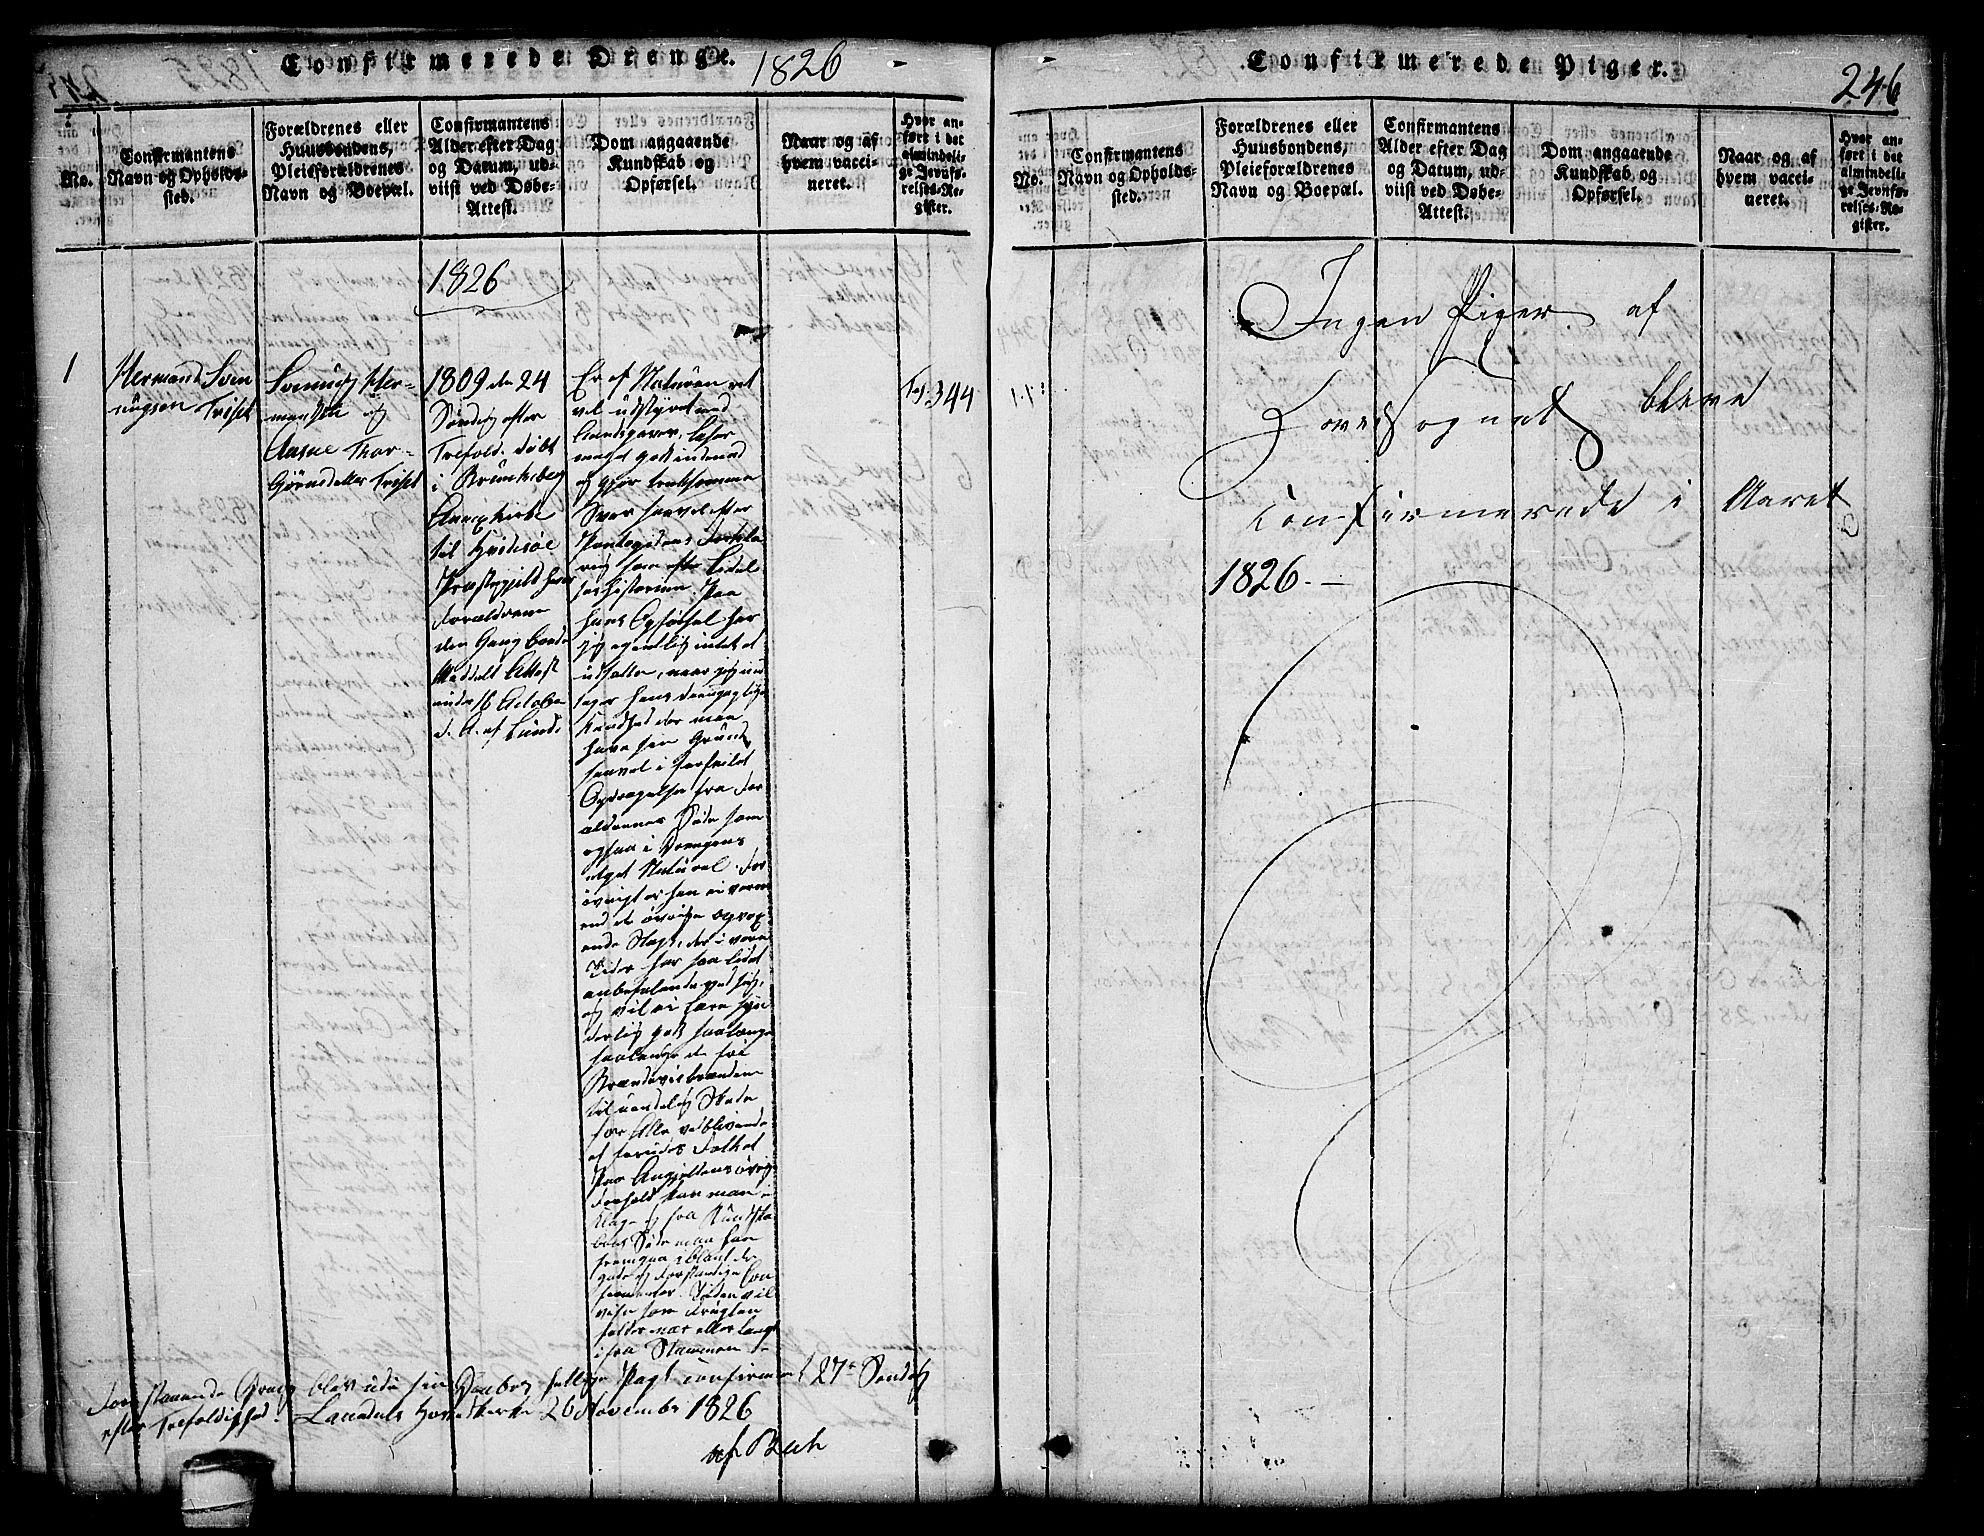 SAKO, Lårdal kirkebøker, G/Ga/L0001: Klokkerbok nr. I 1, 1815-1861, s. 246